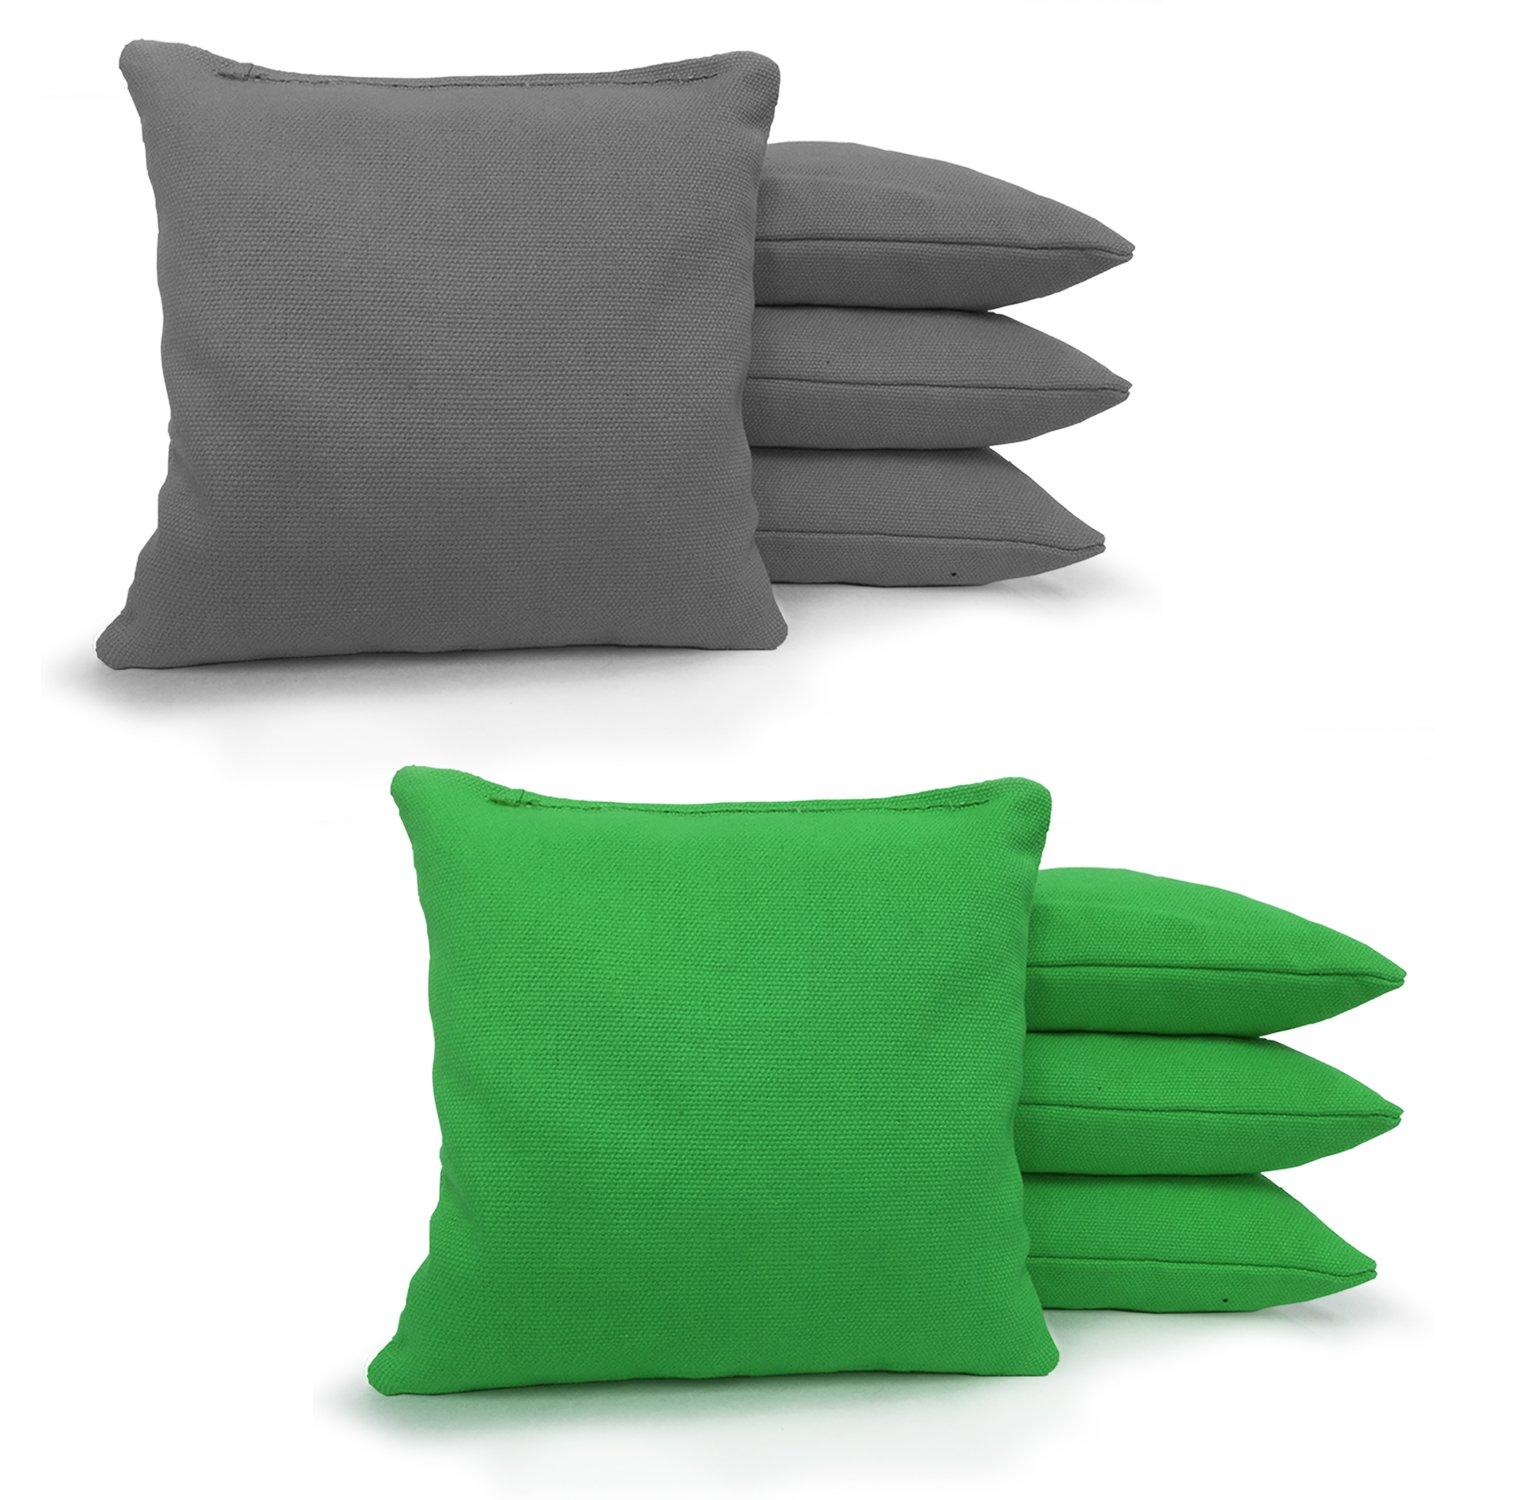 Johnson Enterprises, LLC 8 Standard Corn Filled Regulation Duck Cloth Cornhole Bags 17 Colors Available (You Pick)!! (Grey/Kelly Green) by Johnson Enterprises, LLC